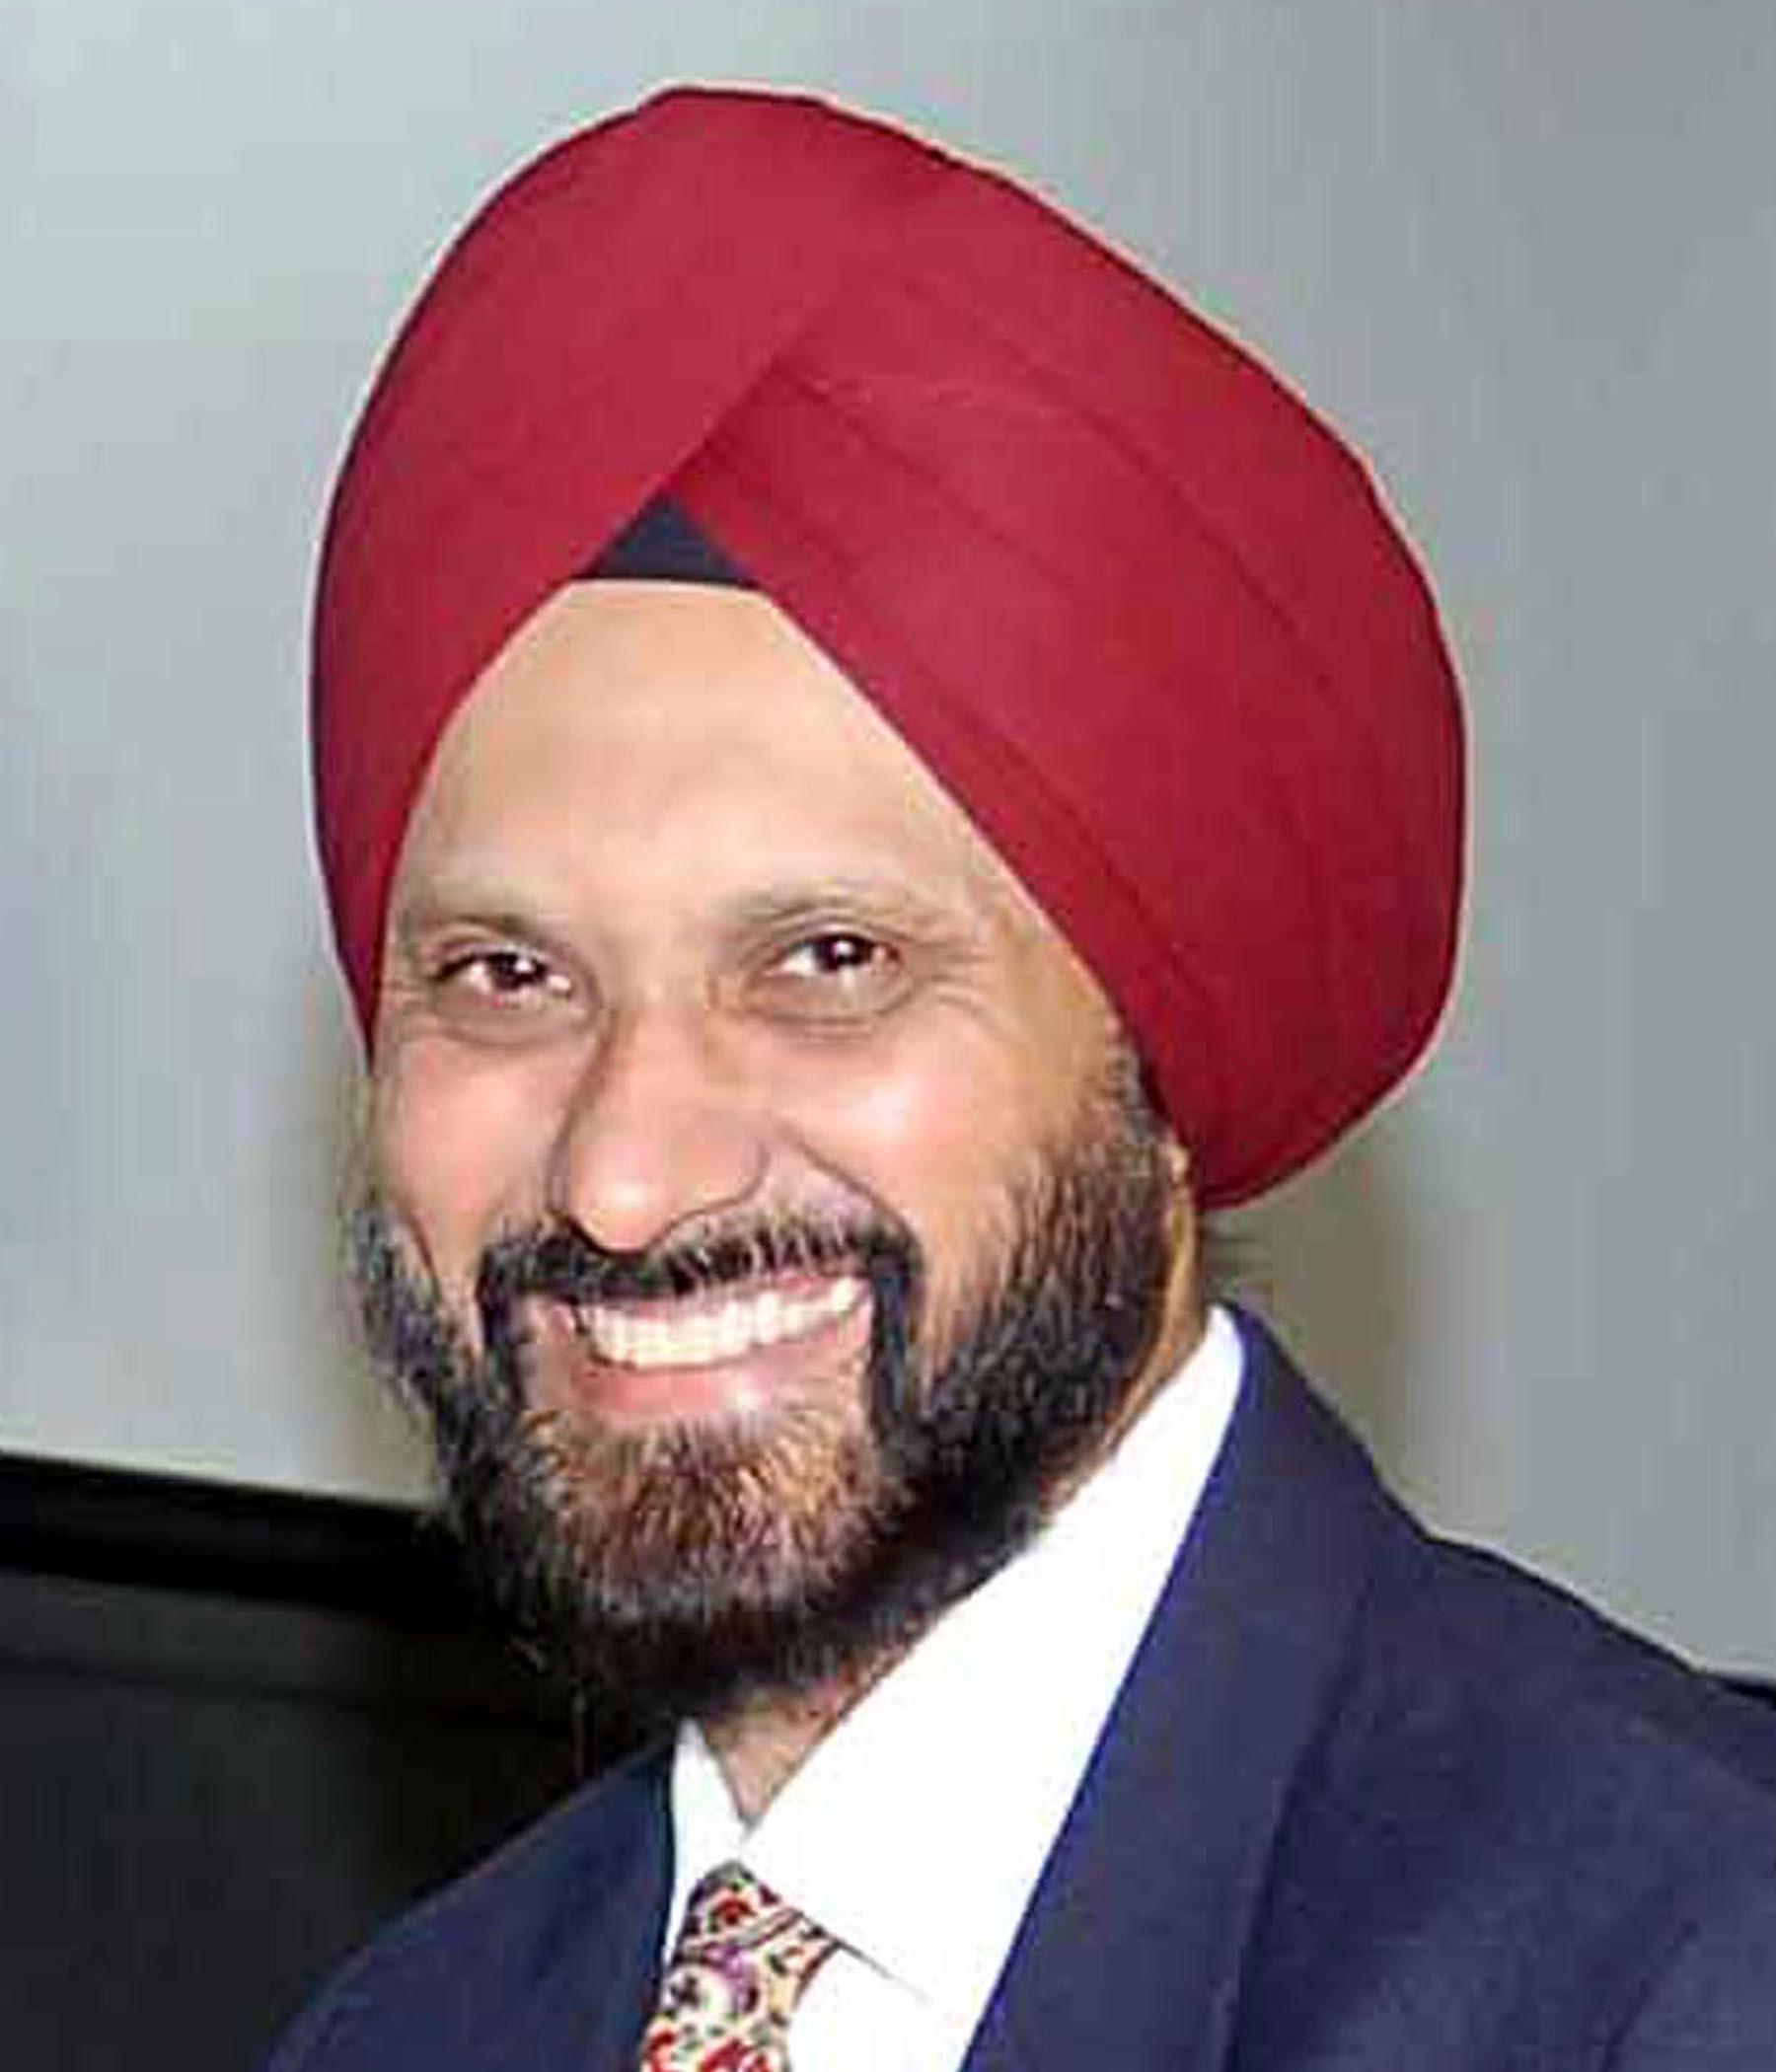 Dr Harinder Singh Bedi  CMC 2014